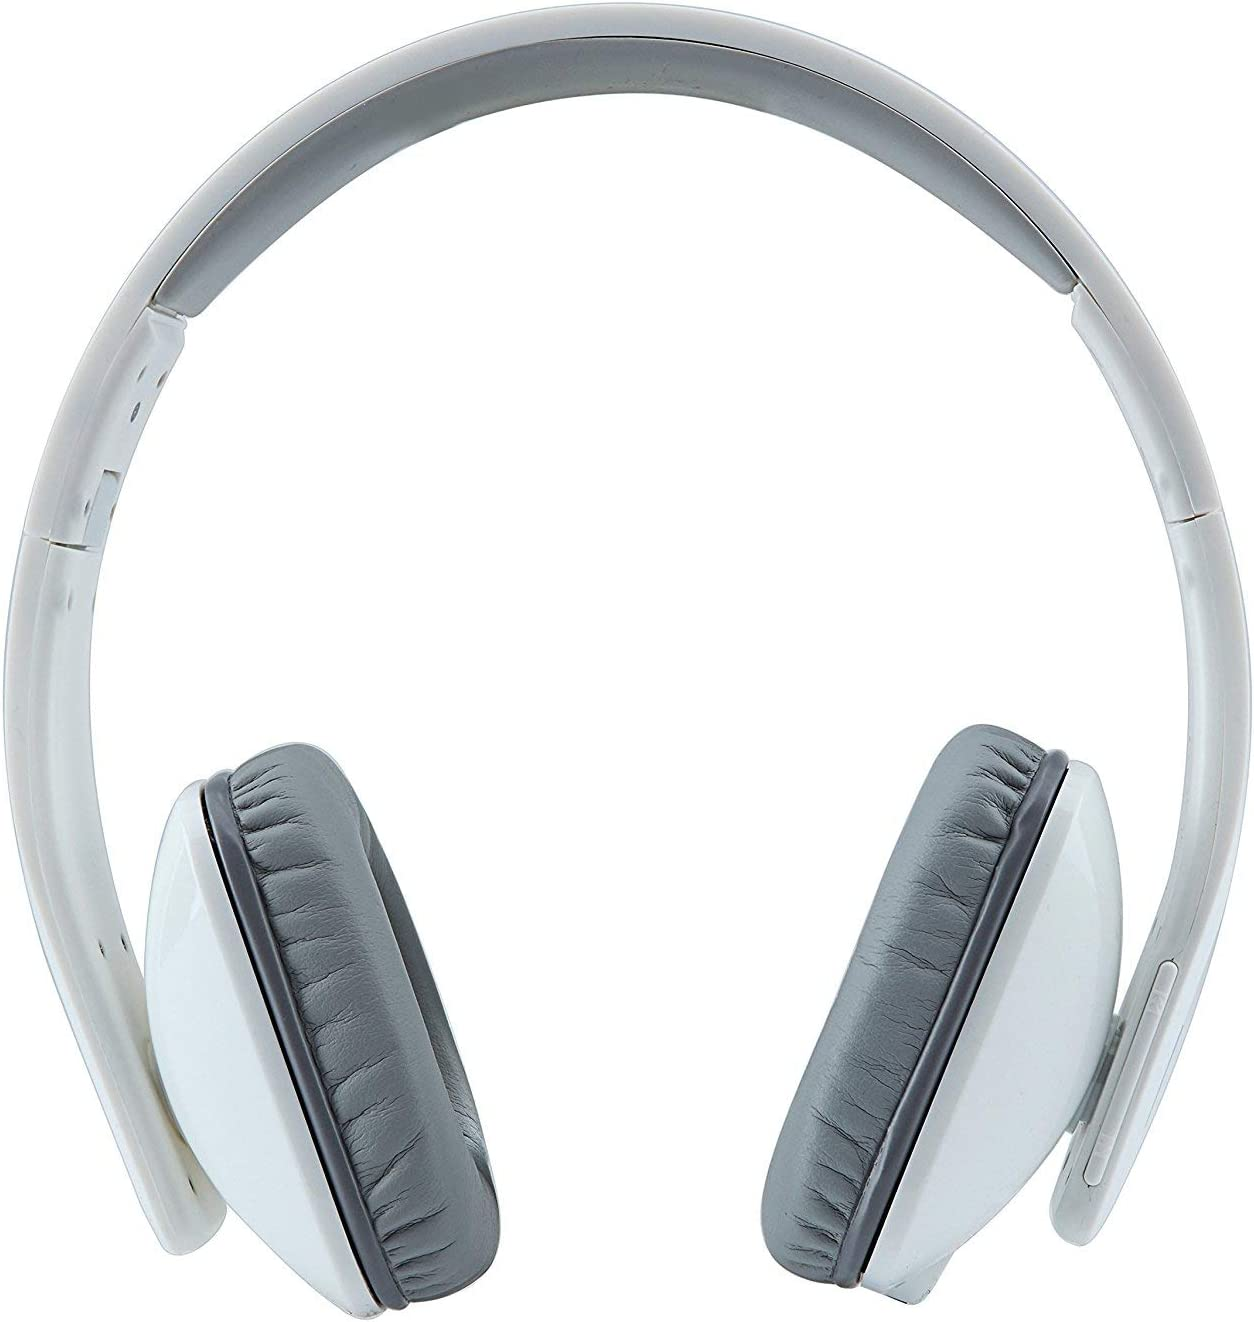 WhiteLabel On Ear Bluetooth Headphones, Standard Style (WL558+White Gray)